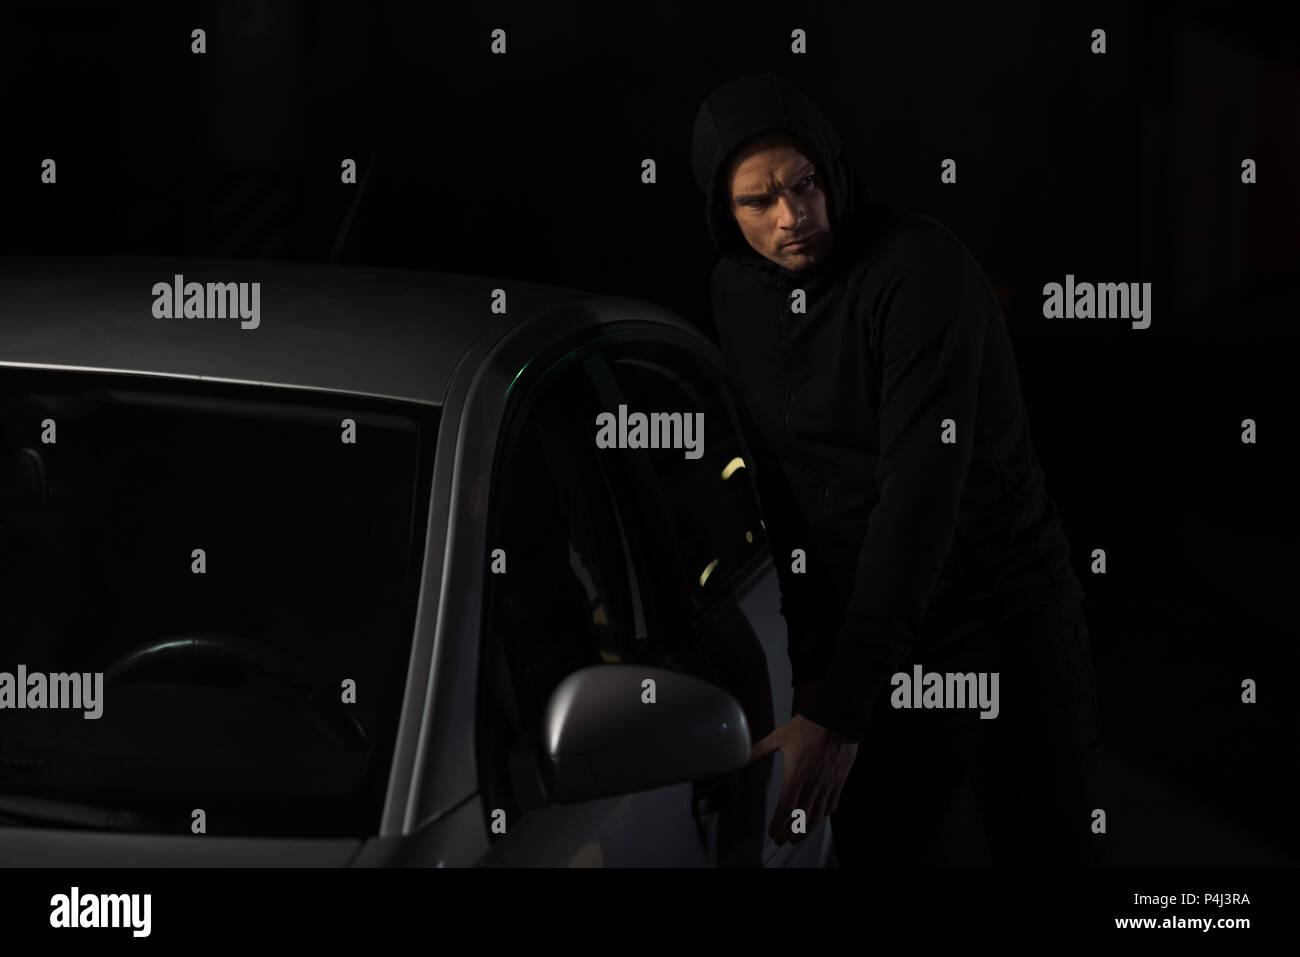 Man With Hoodie Stockfotos & Man With Hoodie Bilder - Seite 13 - Alamy